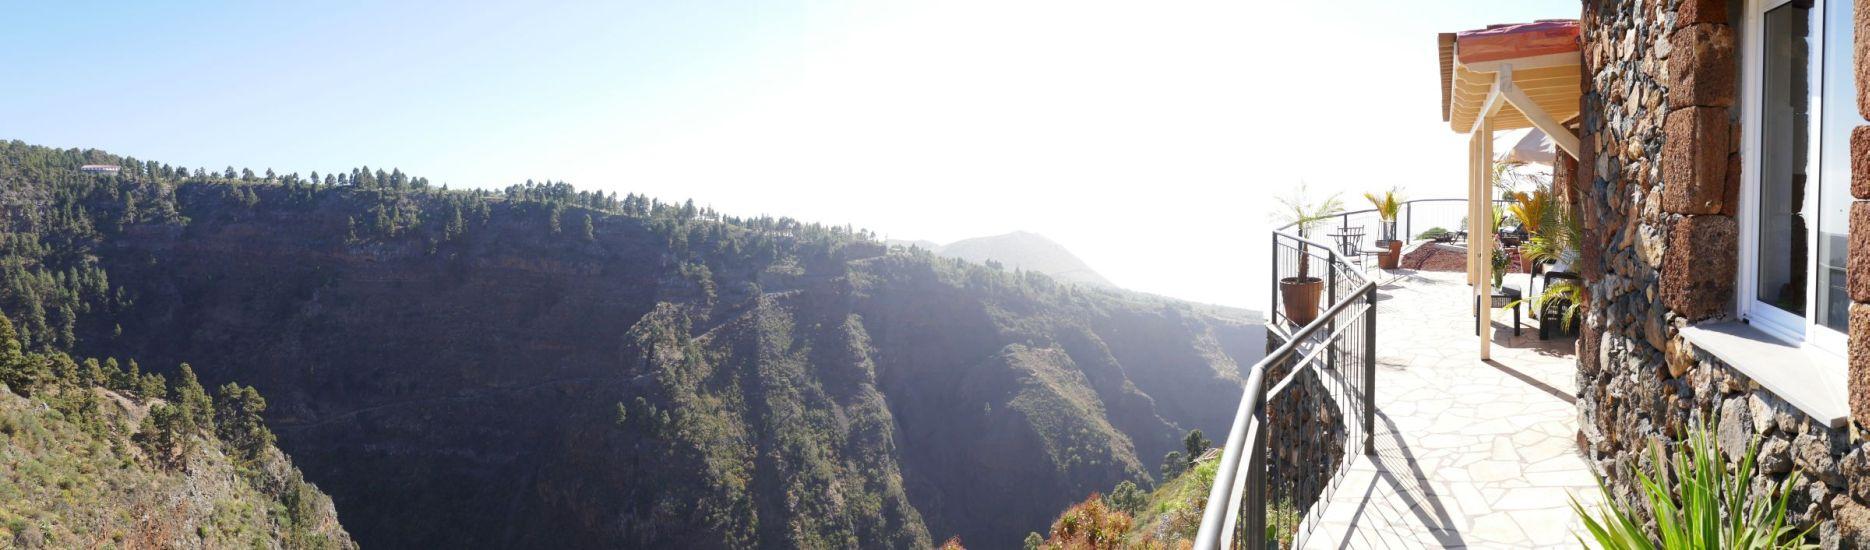 Panorama vanaf het terras van vakantiehuis Las Tricias.